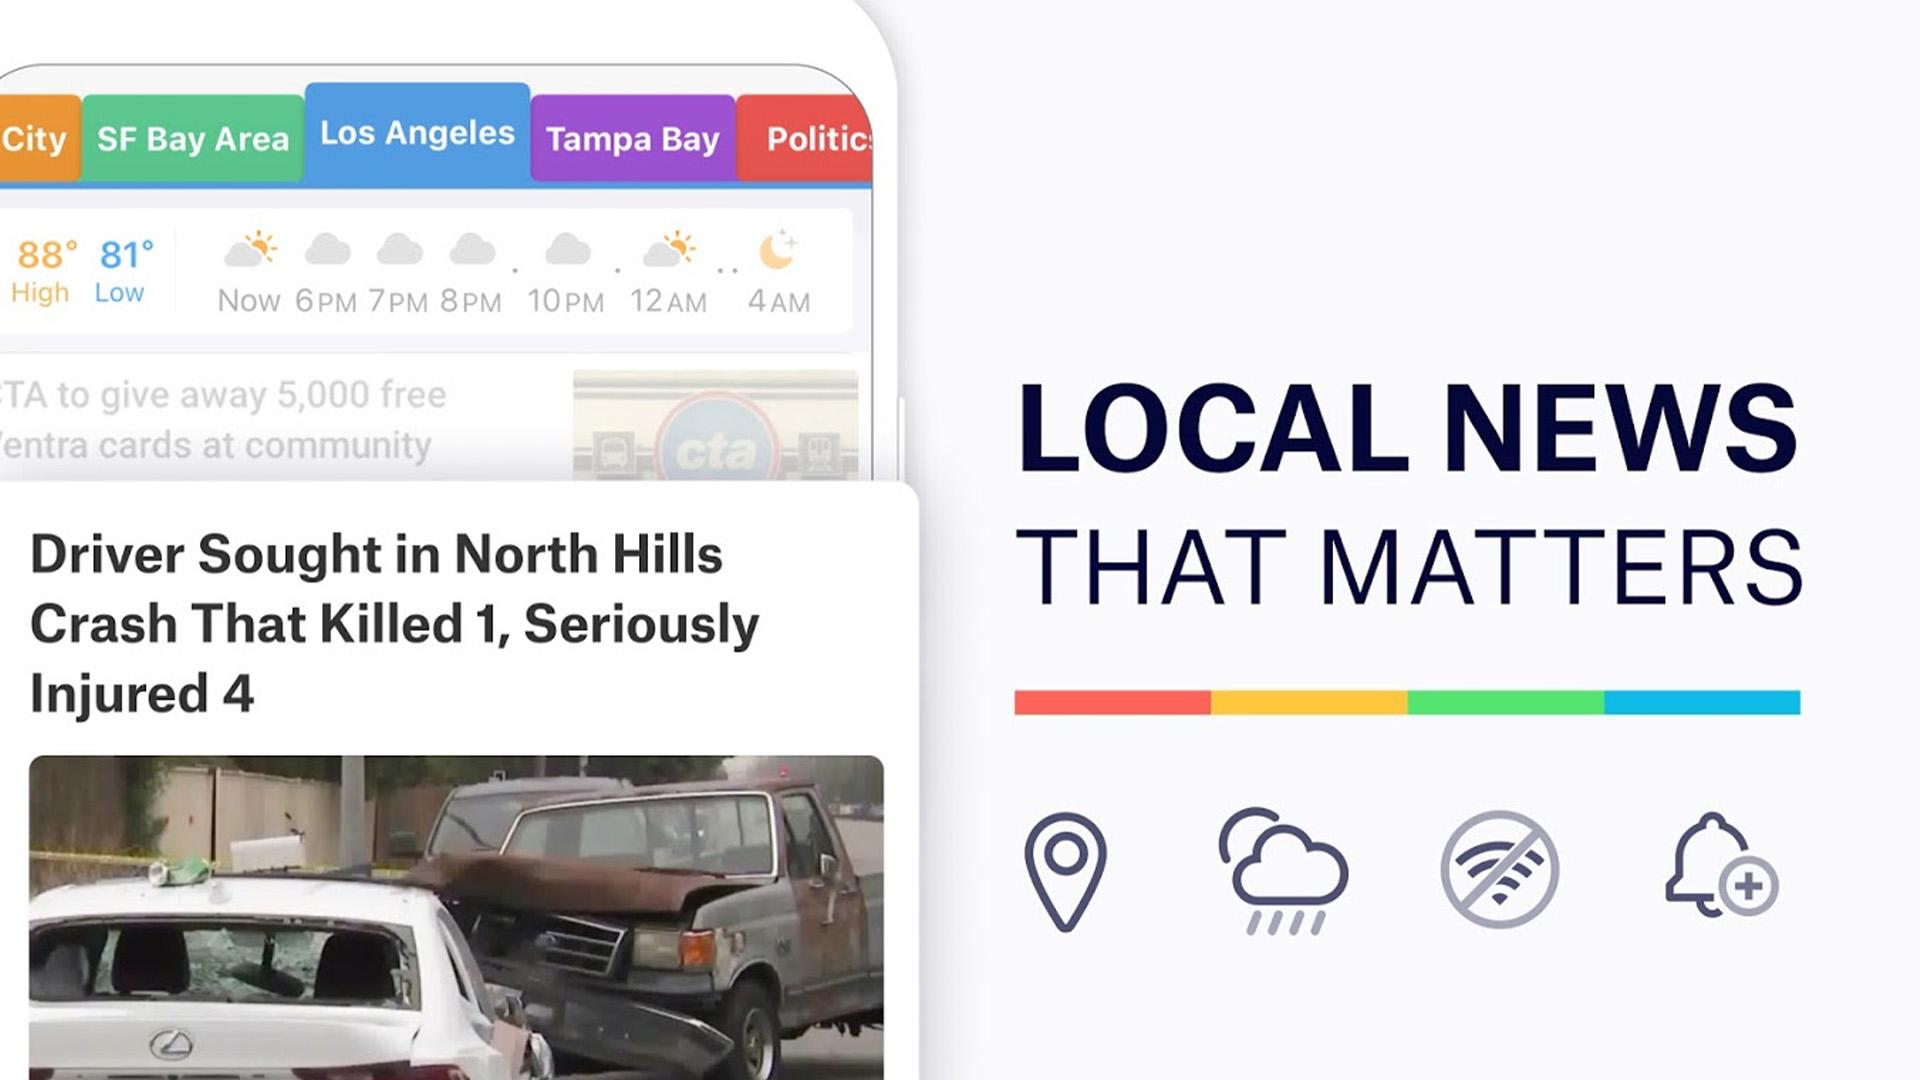 SmartNews screenshot 2021